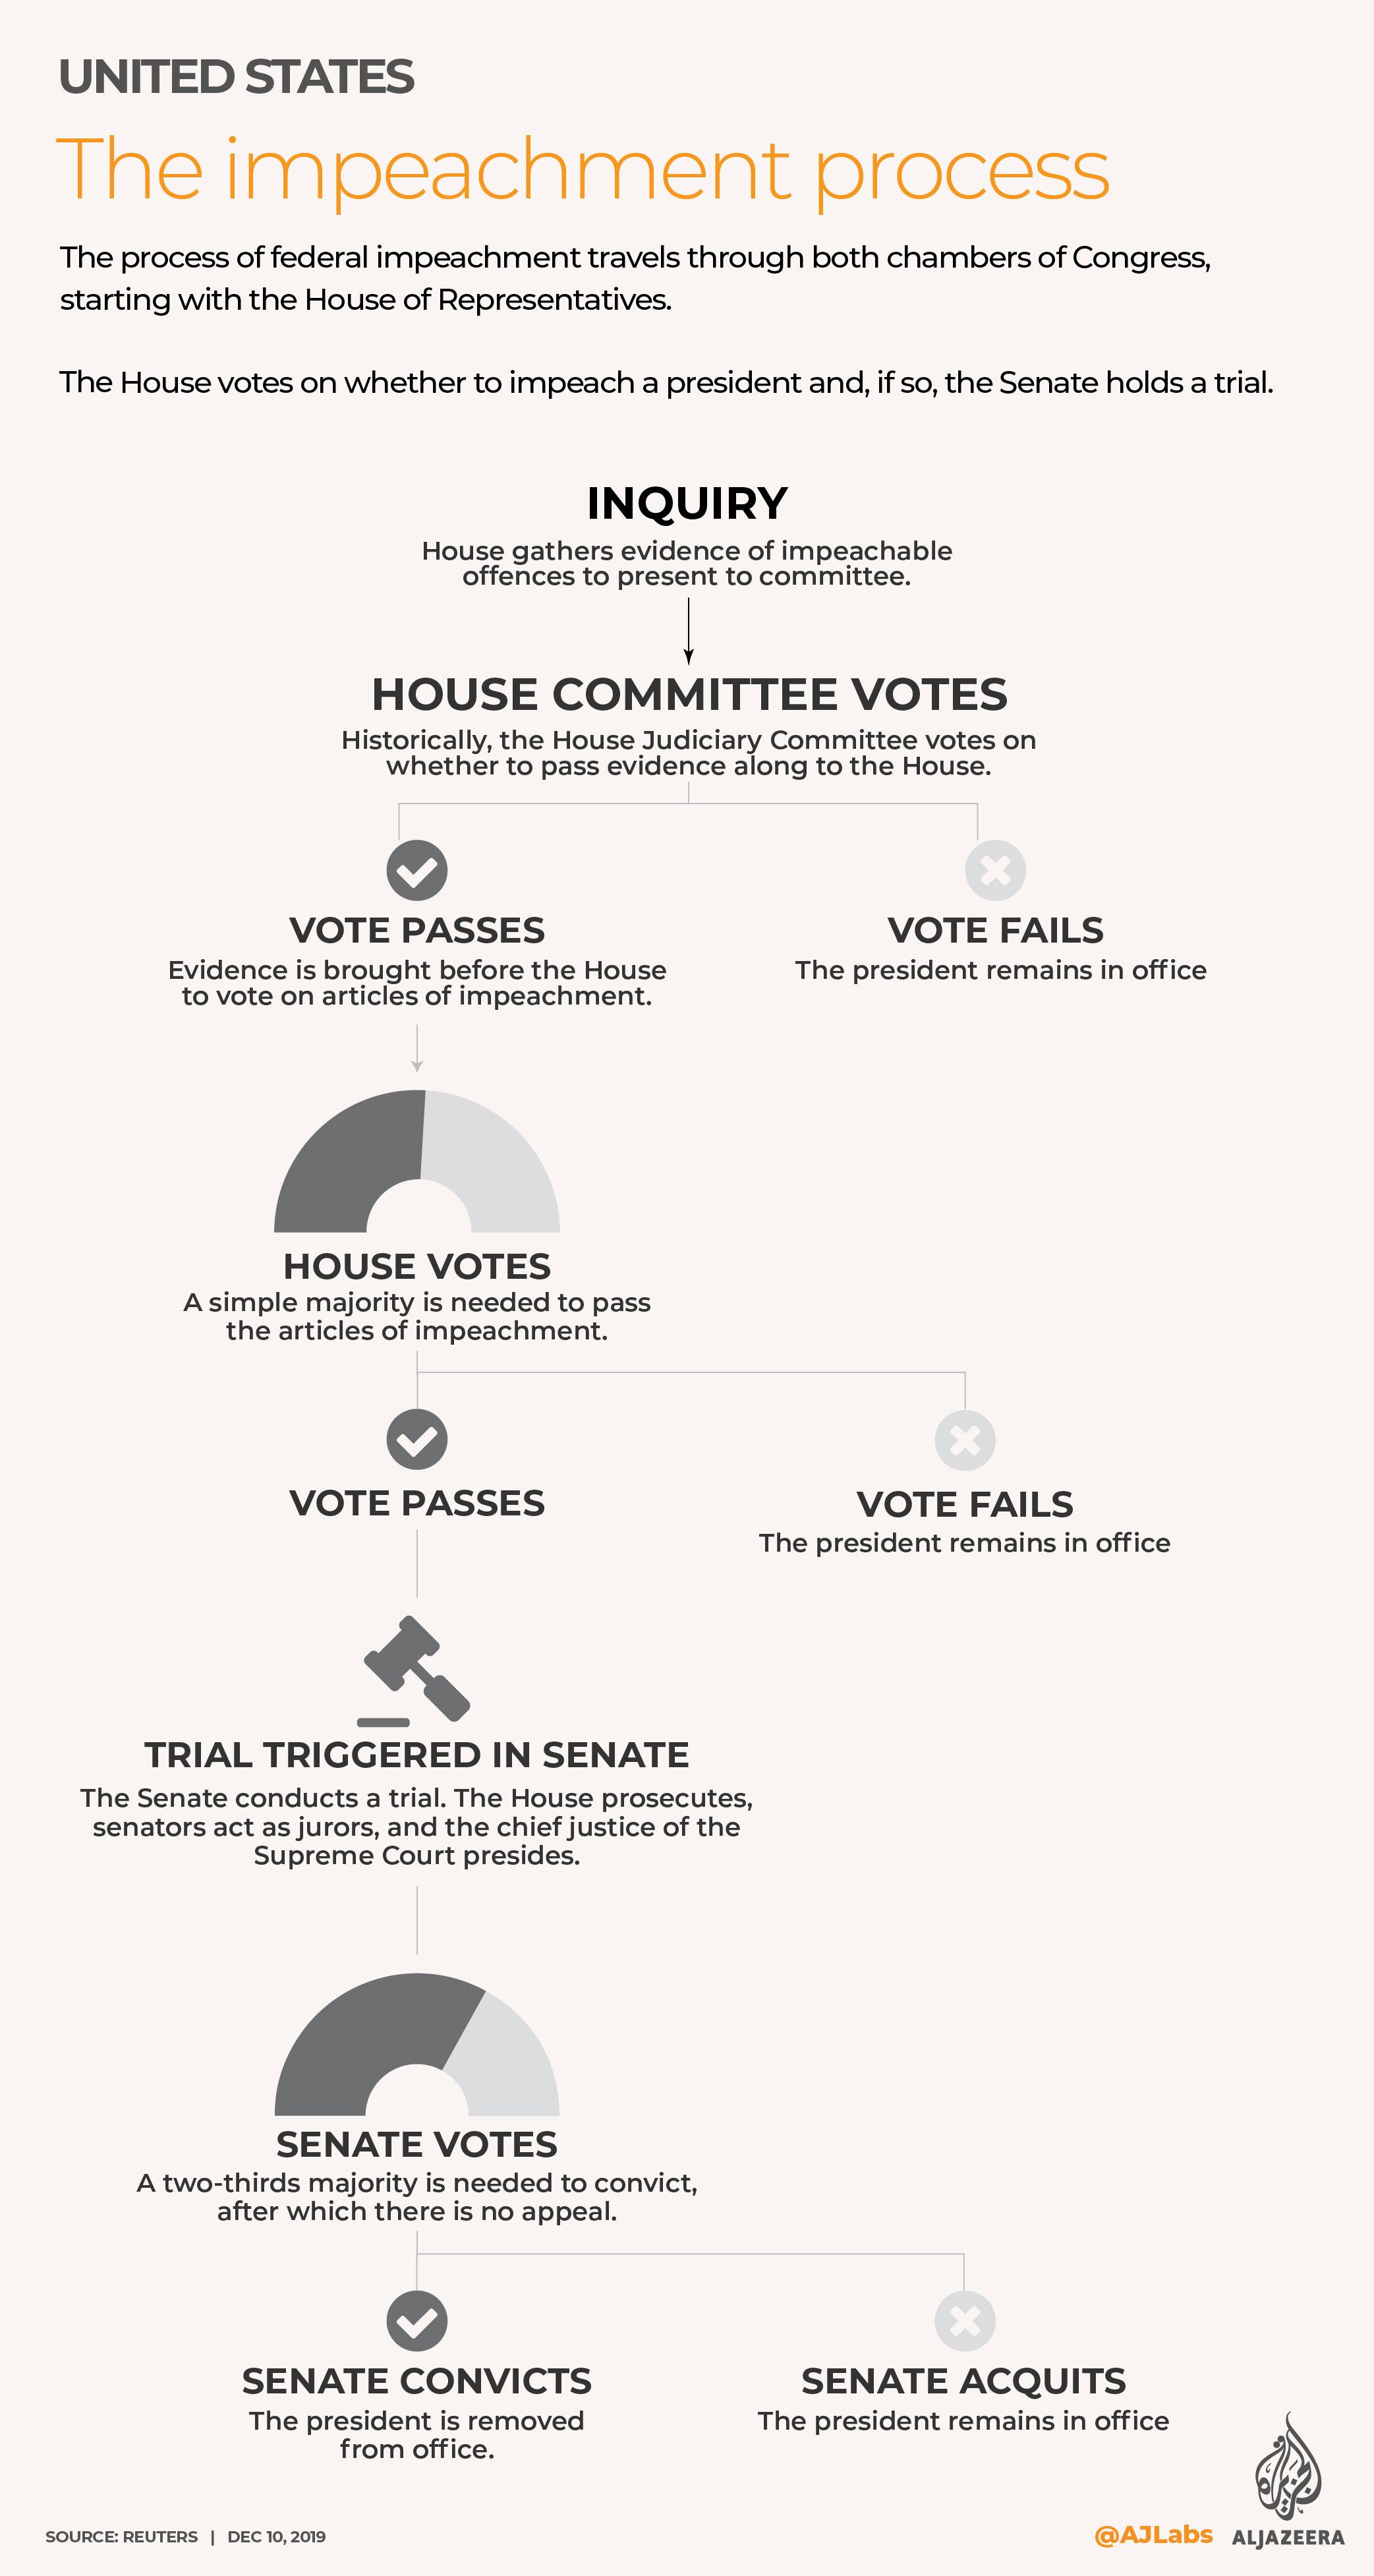 INTERACTIVE - Impeachment process in the USA